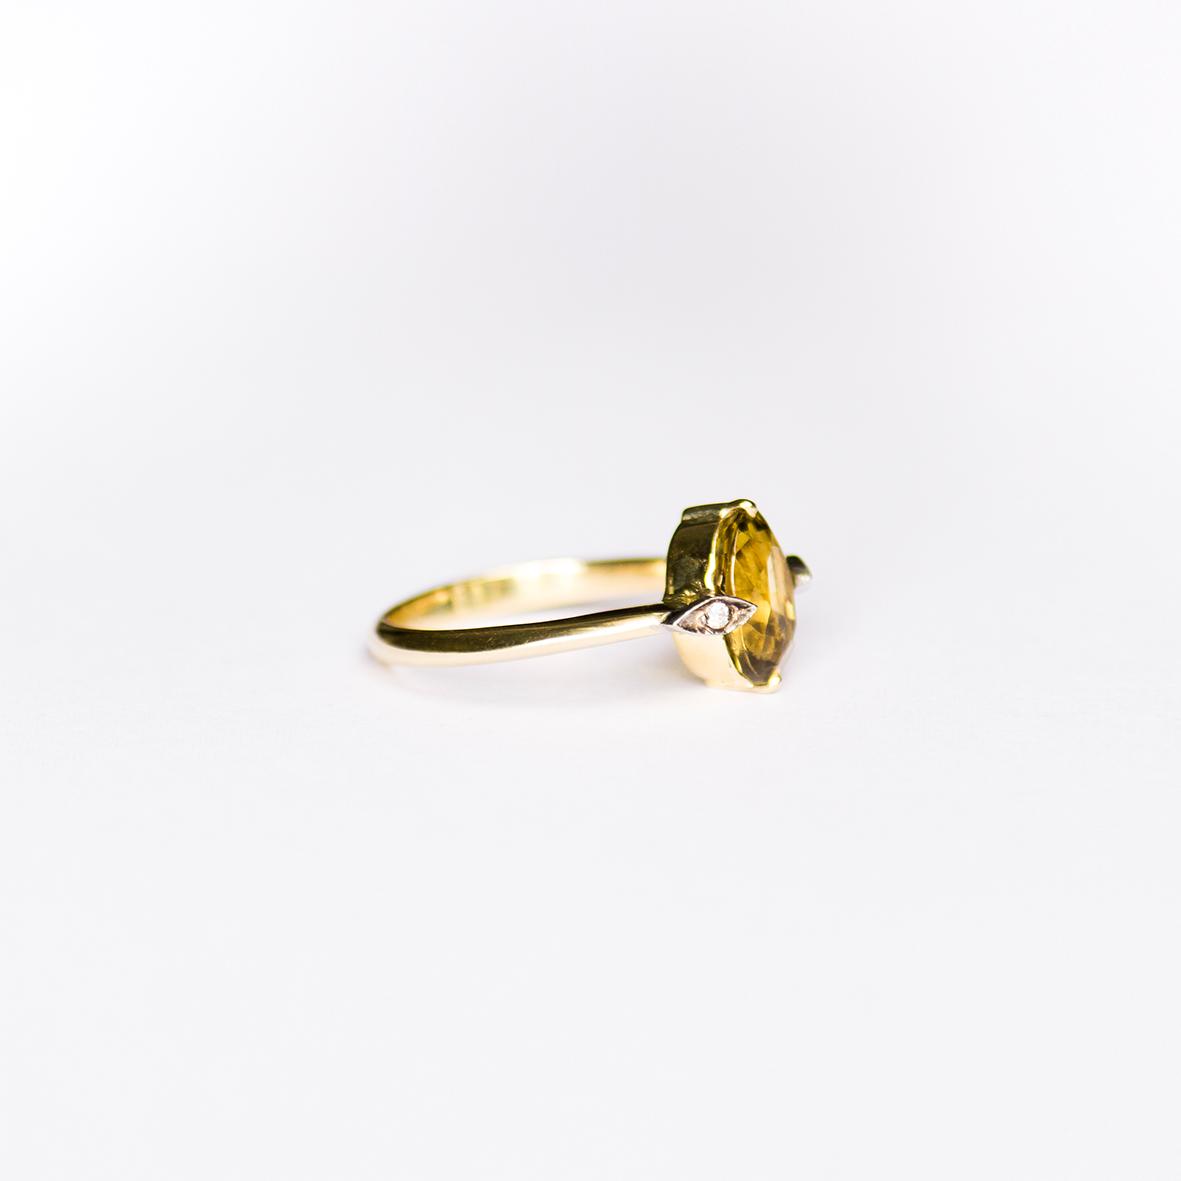 5. OONA_gems of ceylon_ficha2_sinhalite ring